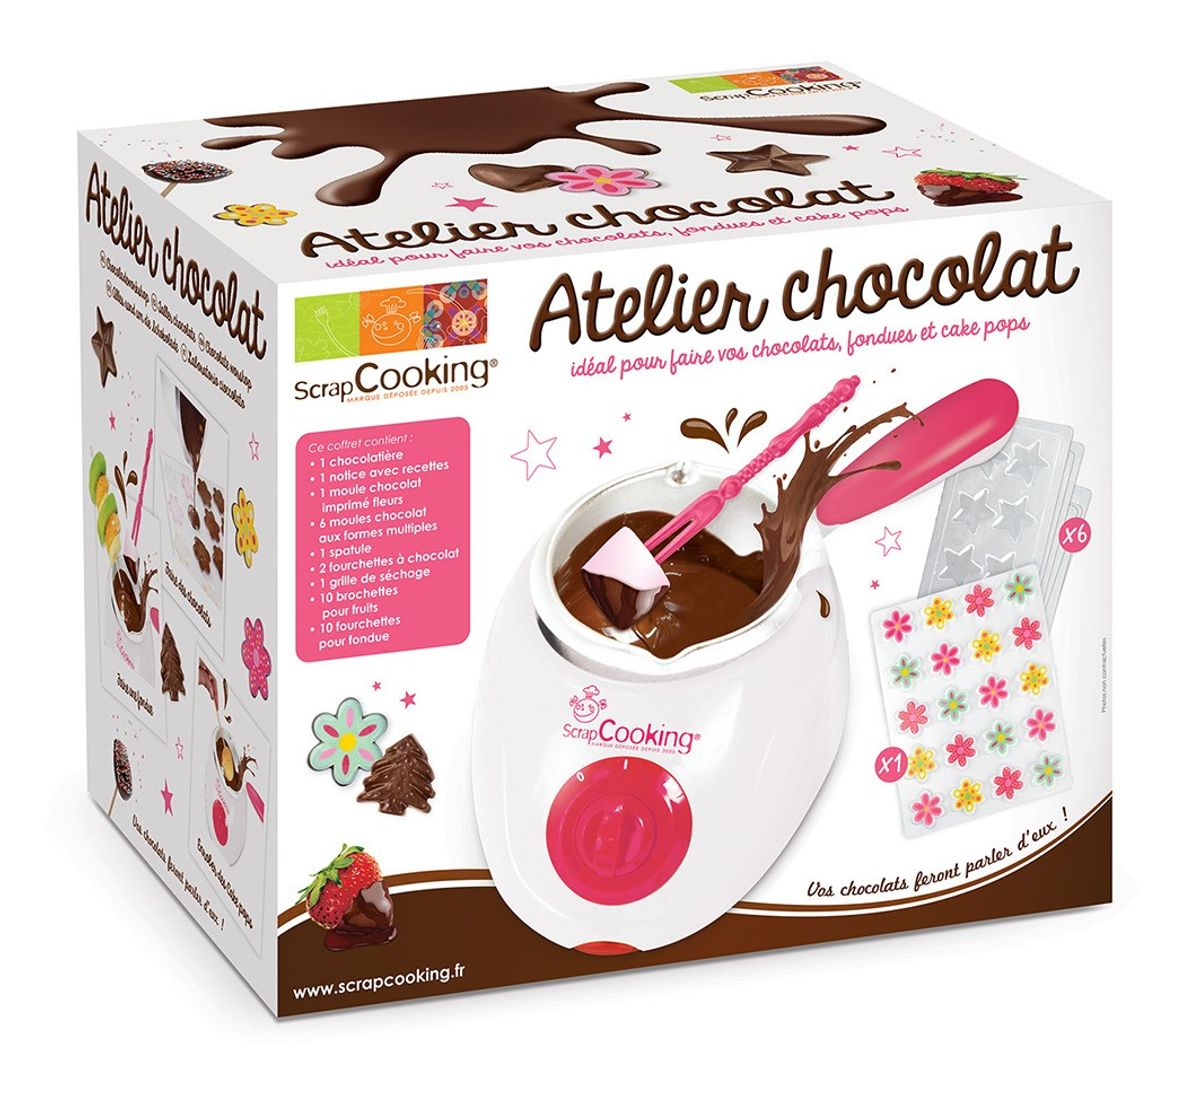 Coffret atelier chocolat - Scrapcooking